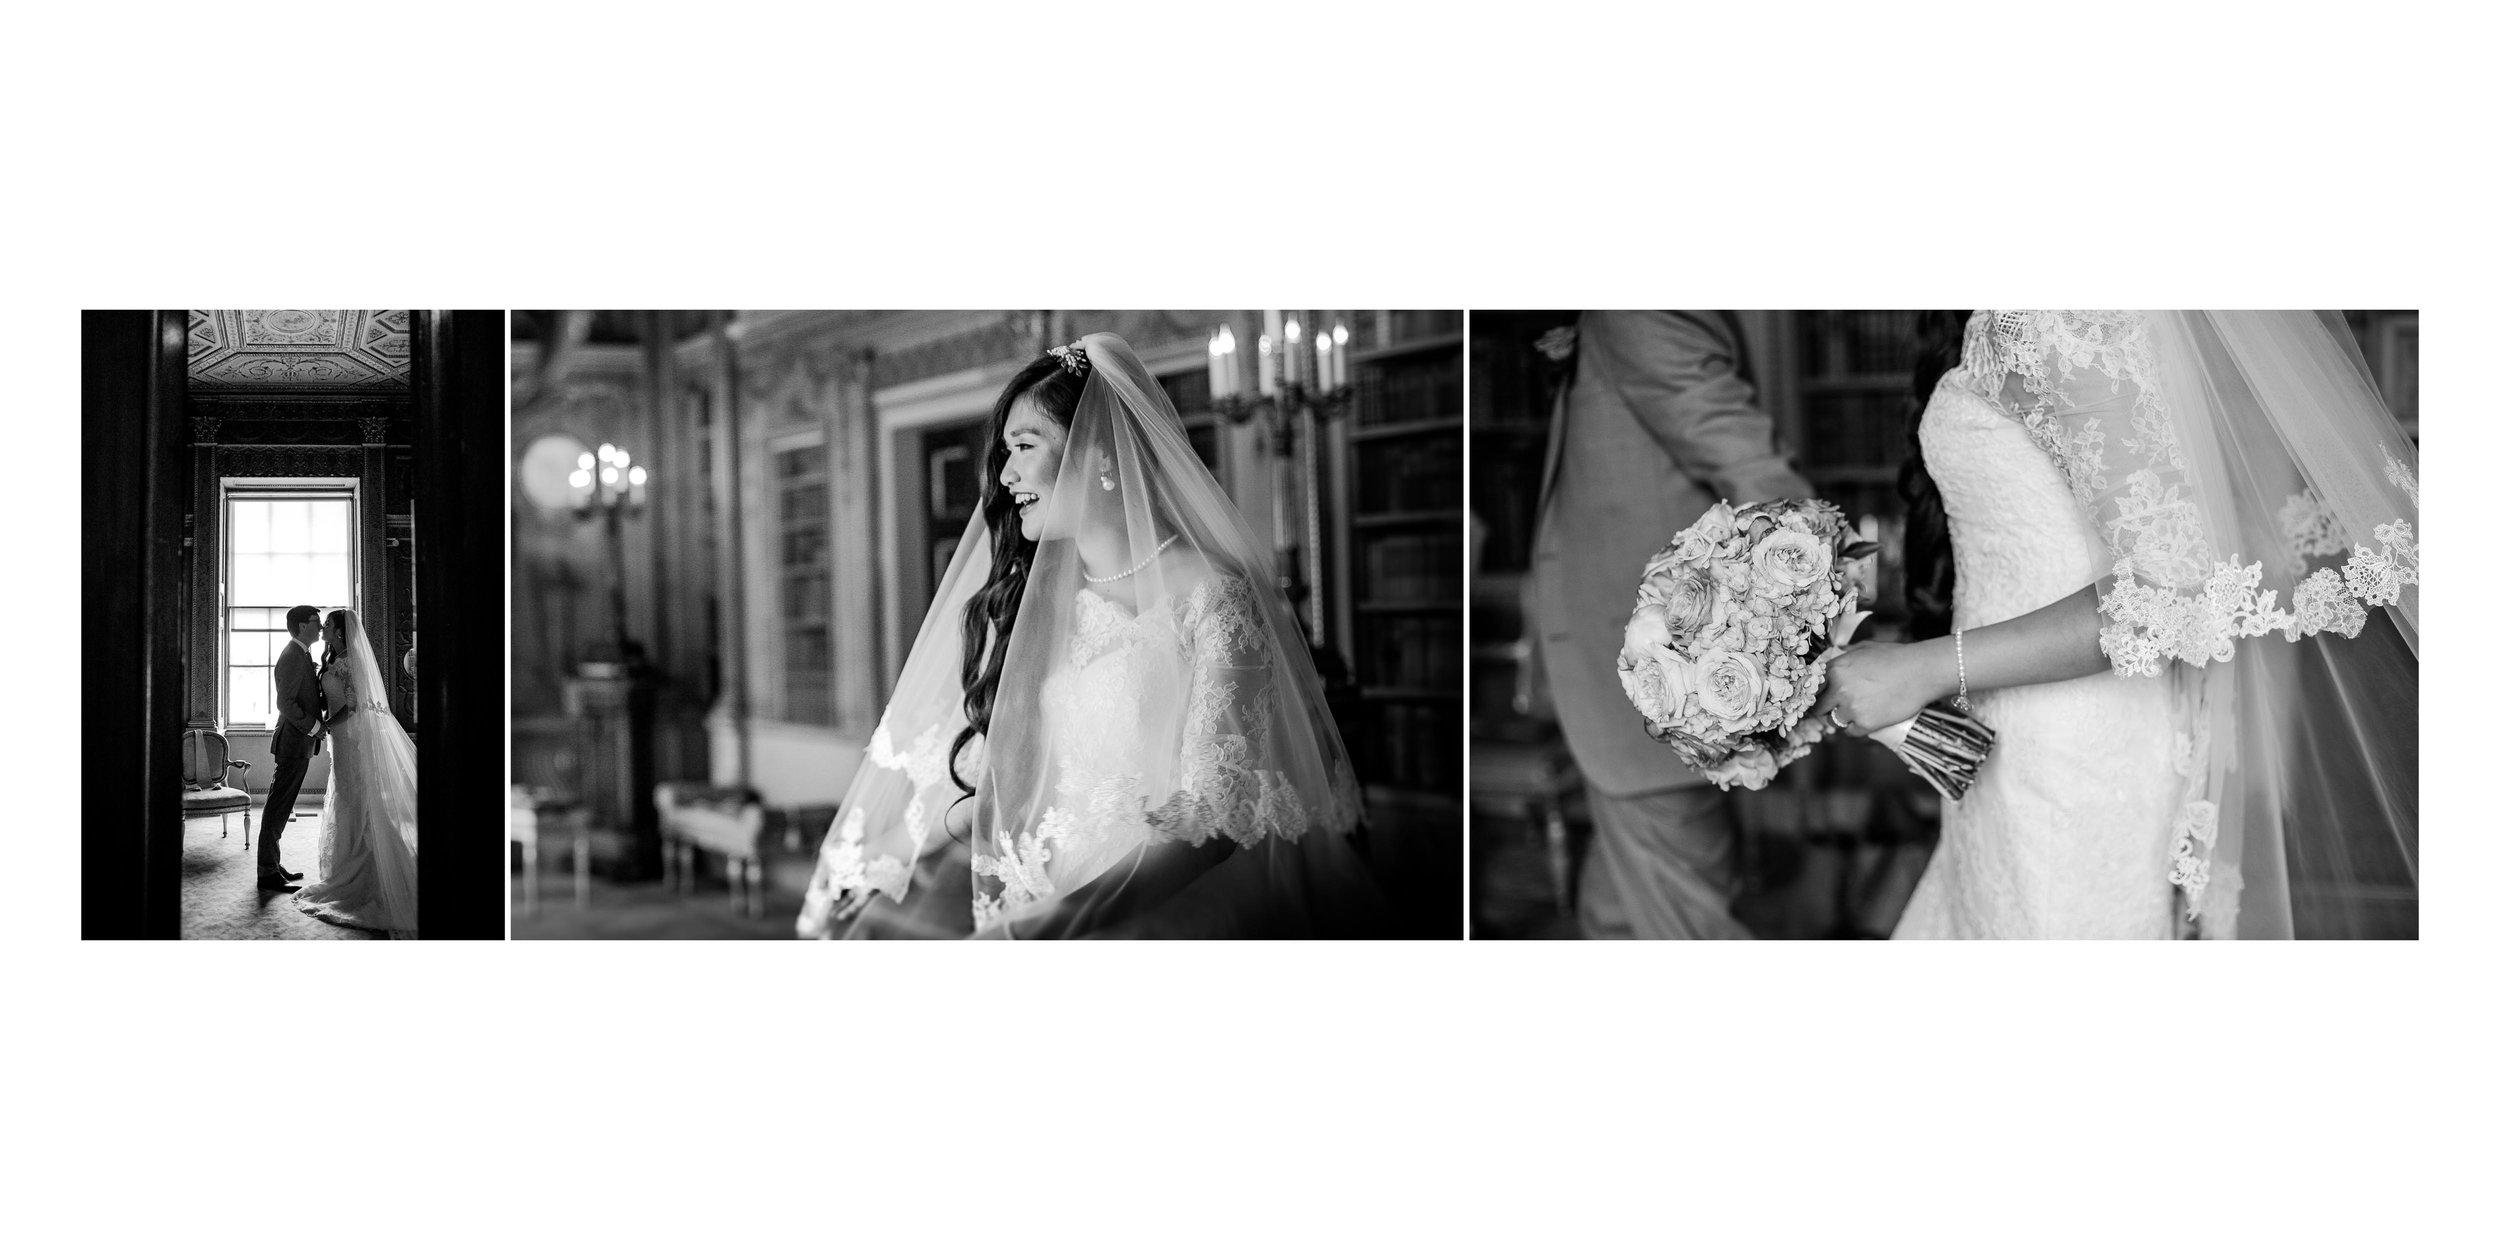 wedding_photographer_surrey_35.jpg